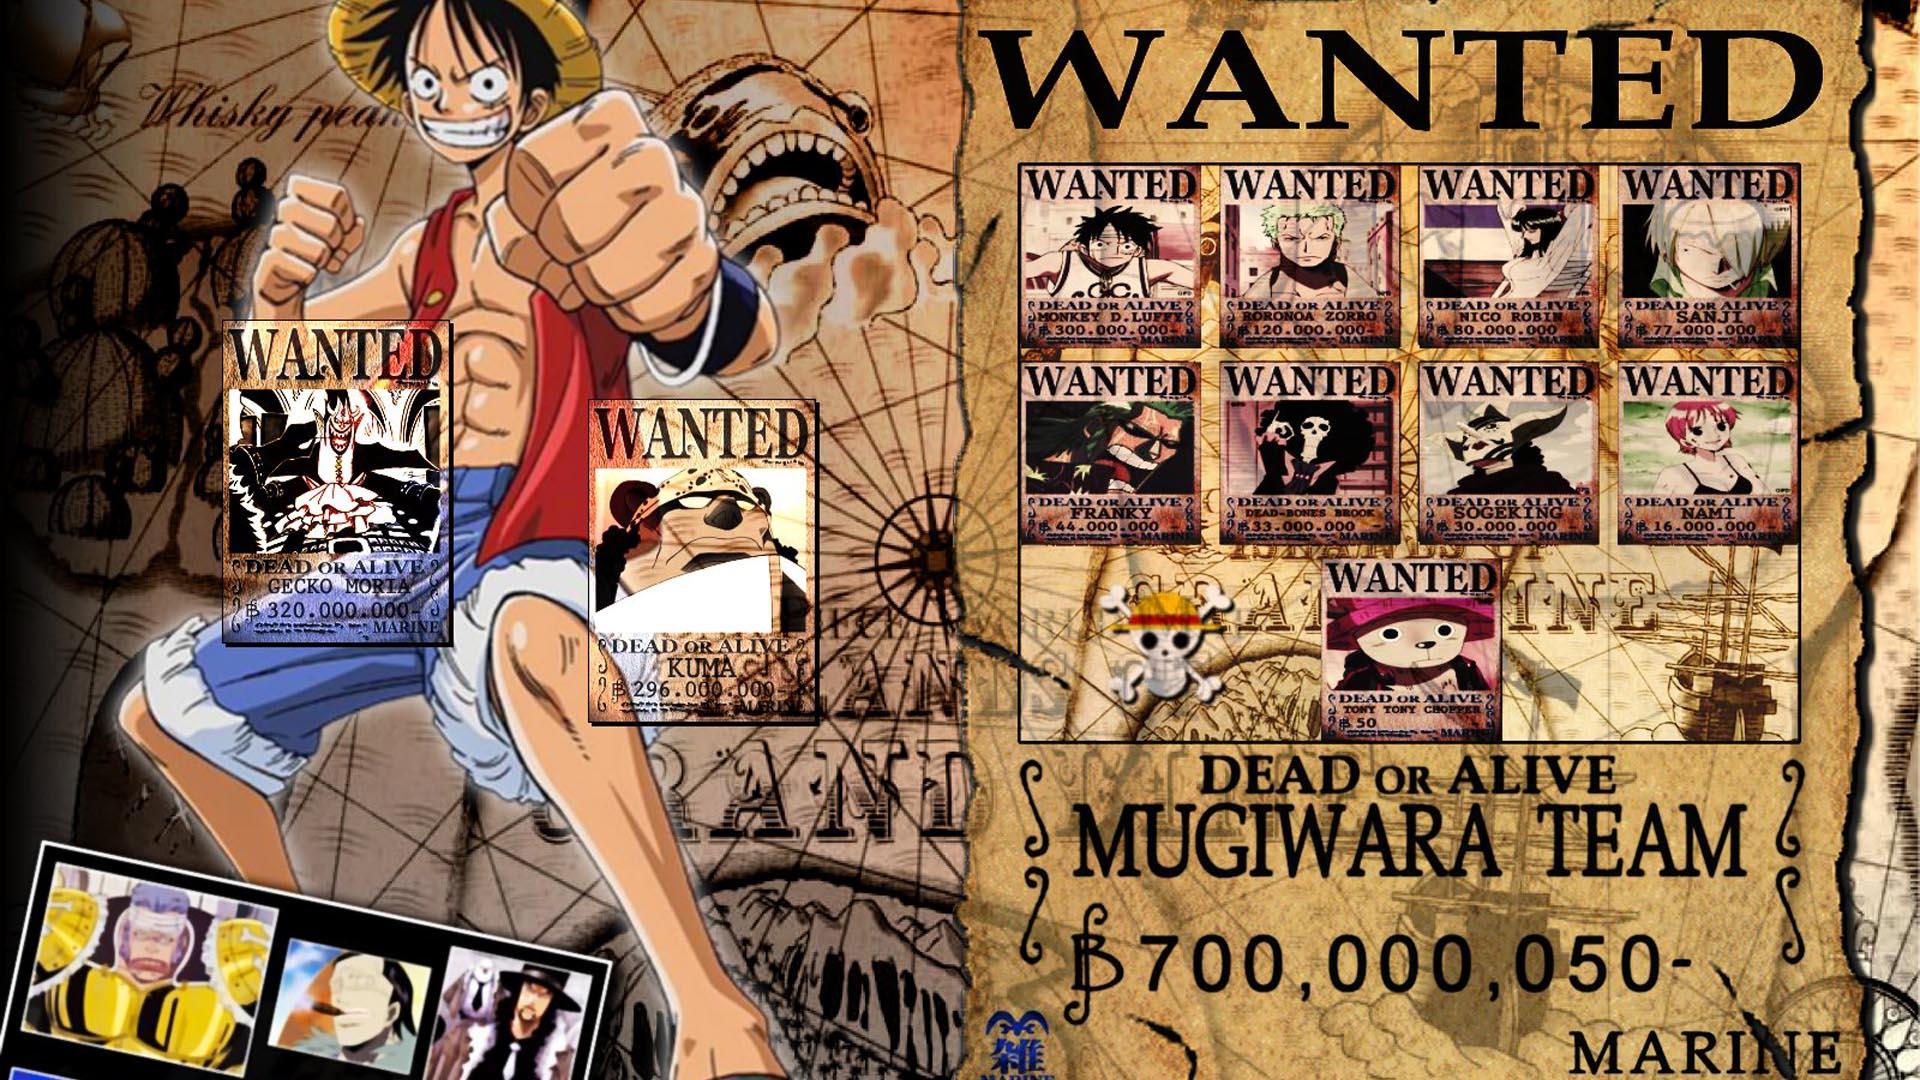 One Piece Wallpaper 1920x1080 Wallpapers 1920x1080 Wallpapers 1920x1080